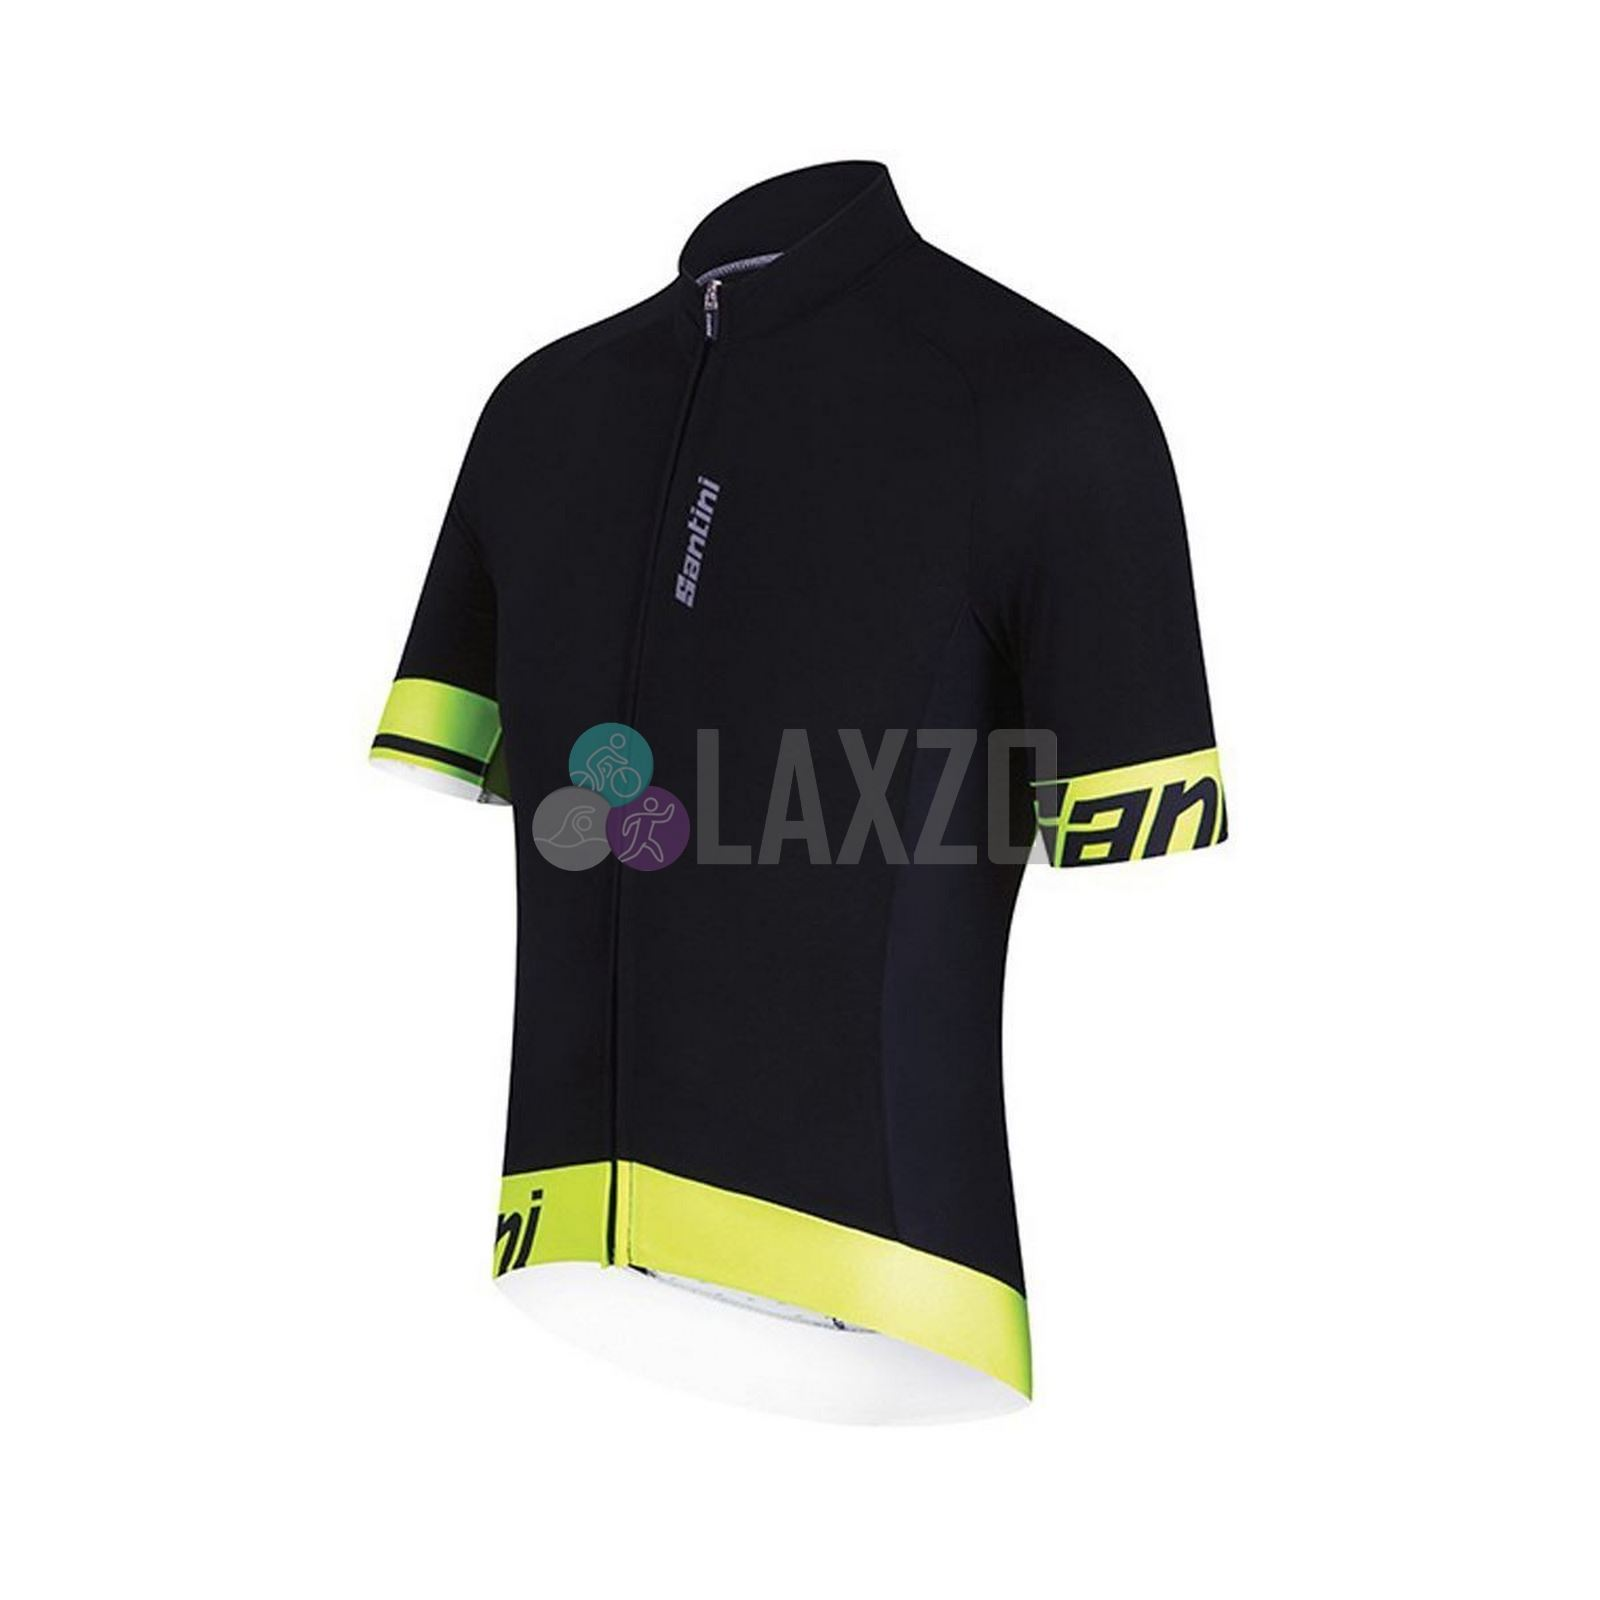 Details about Cycling Jersey Short Sleeve Santini Sleek 2.0 Aero Yellow  Medium Full Zip bf6b54e010